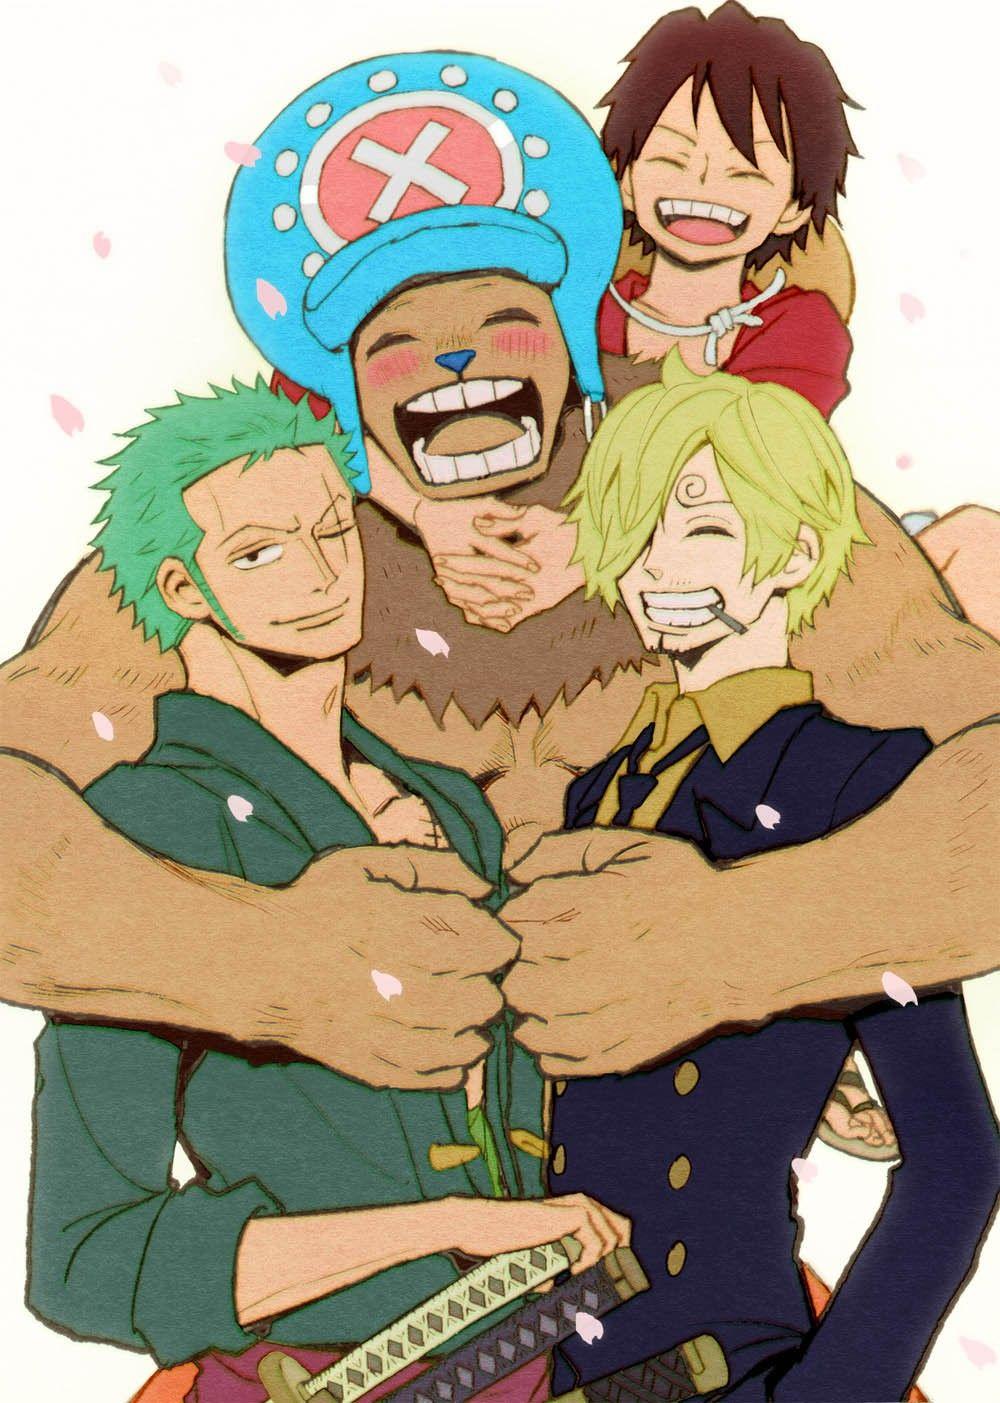 Nakama By Vovo2000_ZS | Manga anime one piece, One piece comic, One piece anime